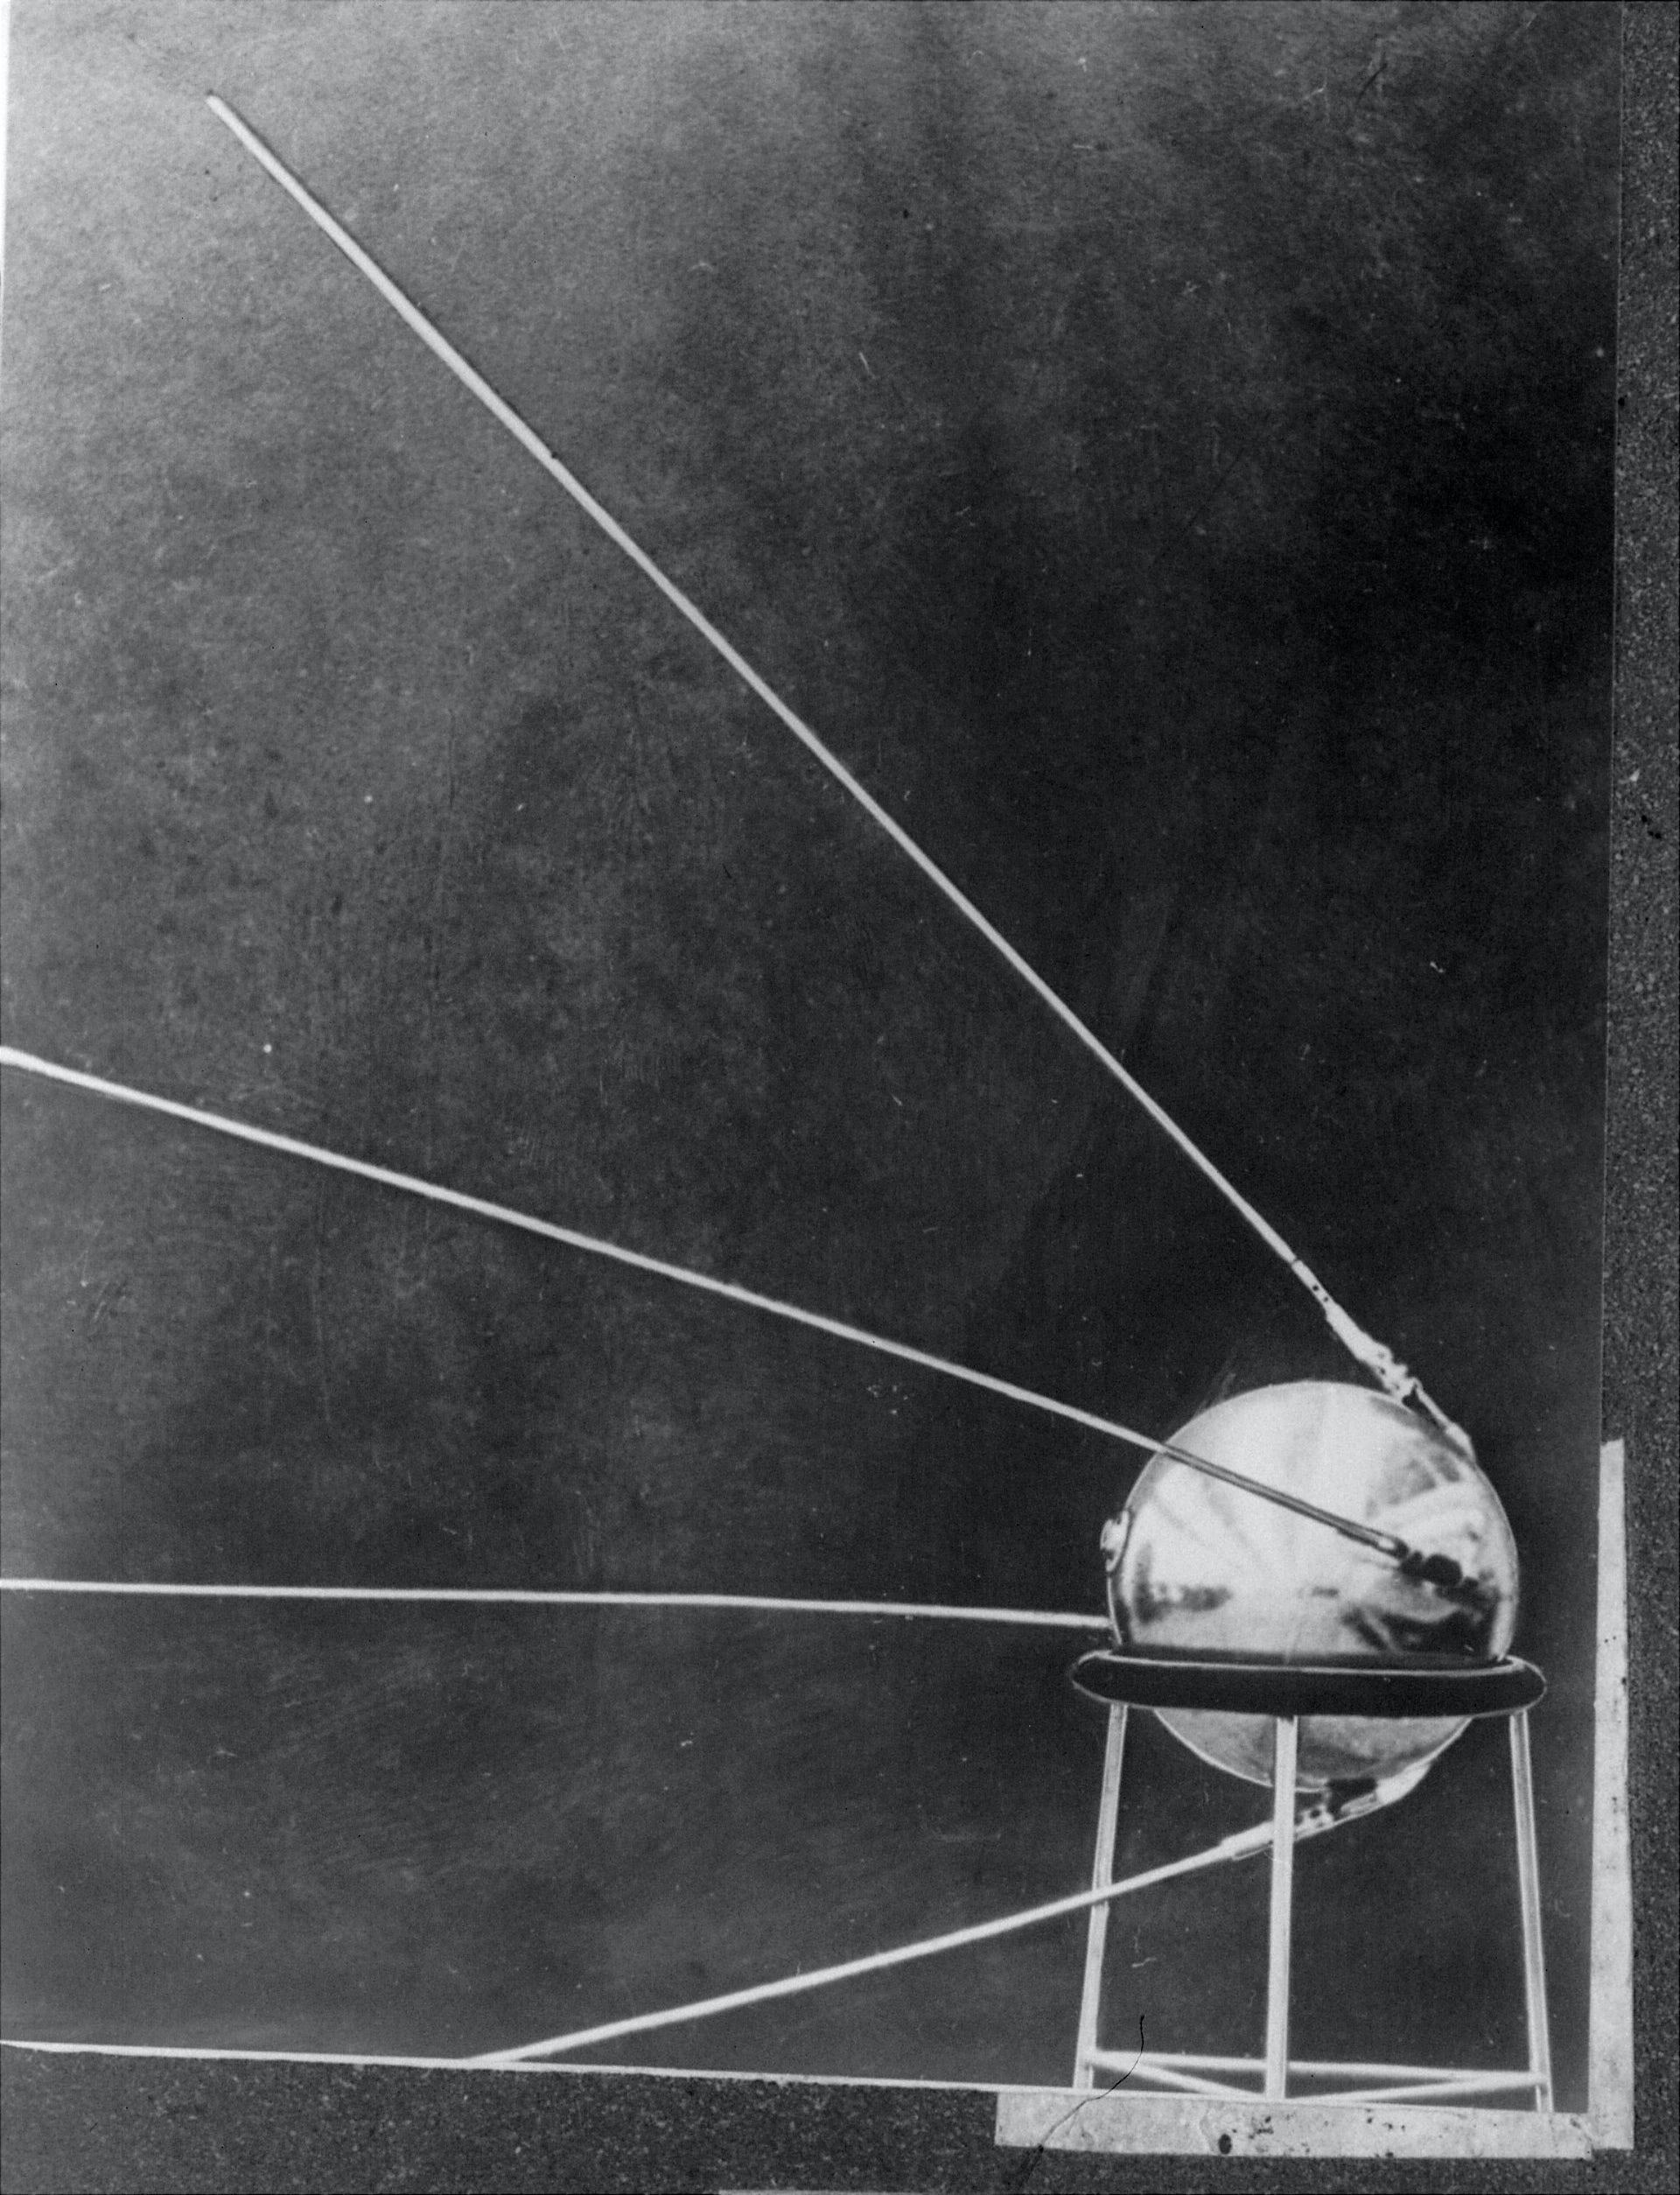 Soviet satellite Sputnik